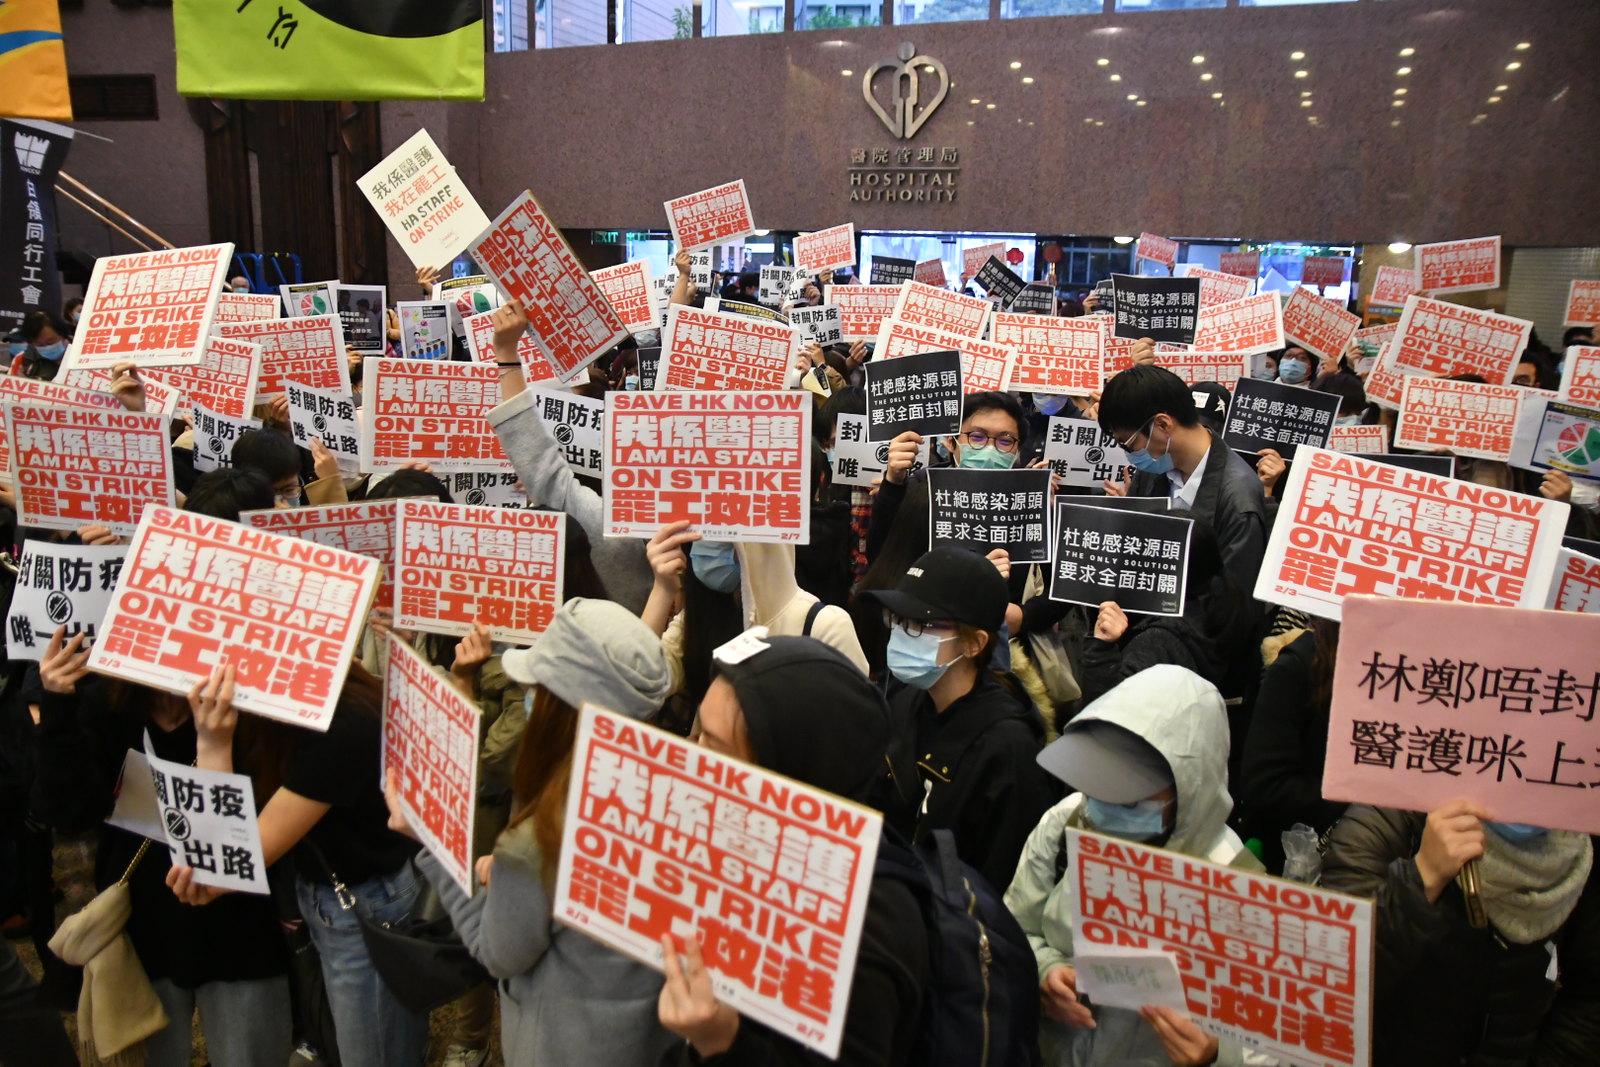 Hong Kong Hospital Authority medics strike February 4, 2020